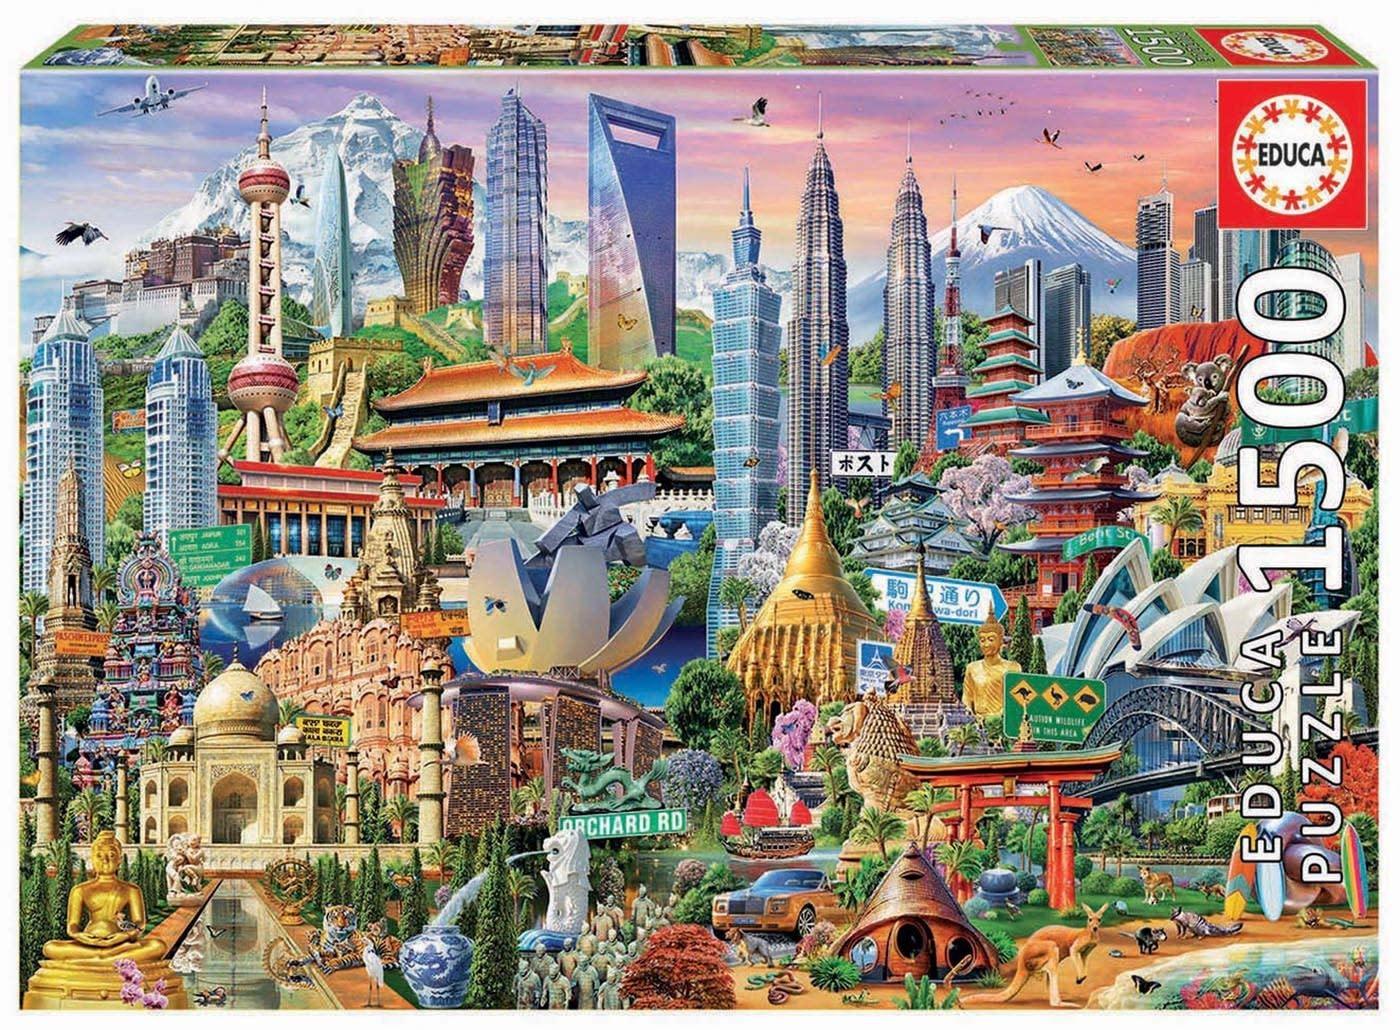 JOHN HANSEN COMPANY ED1500 ASIA LANDMARKS